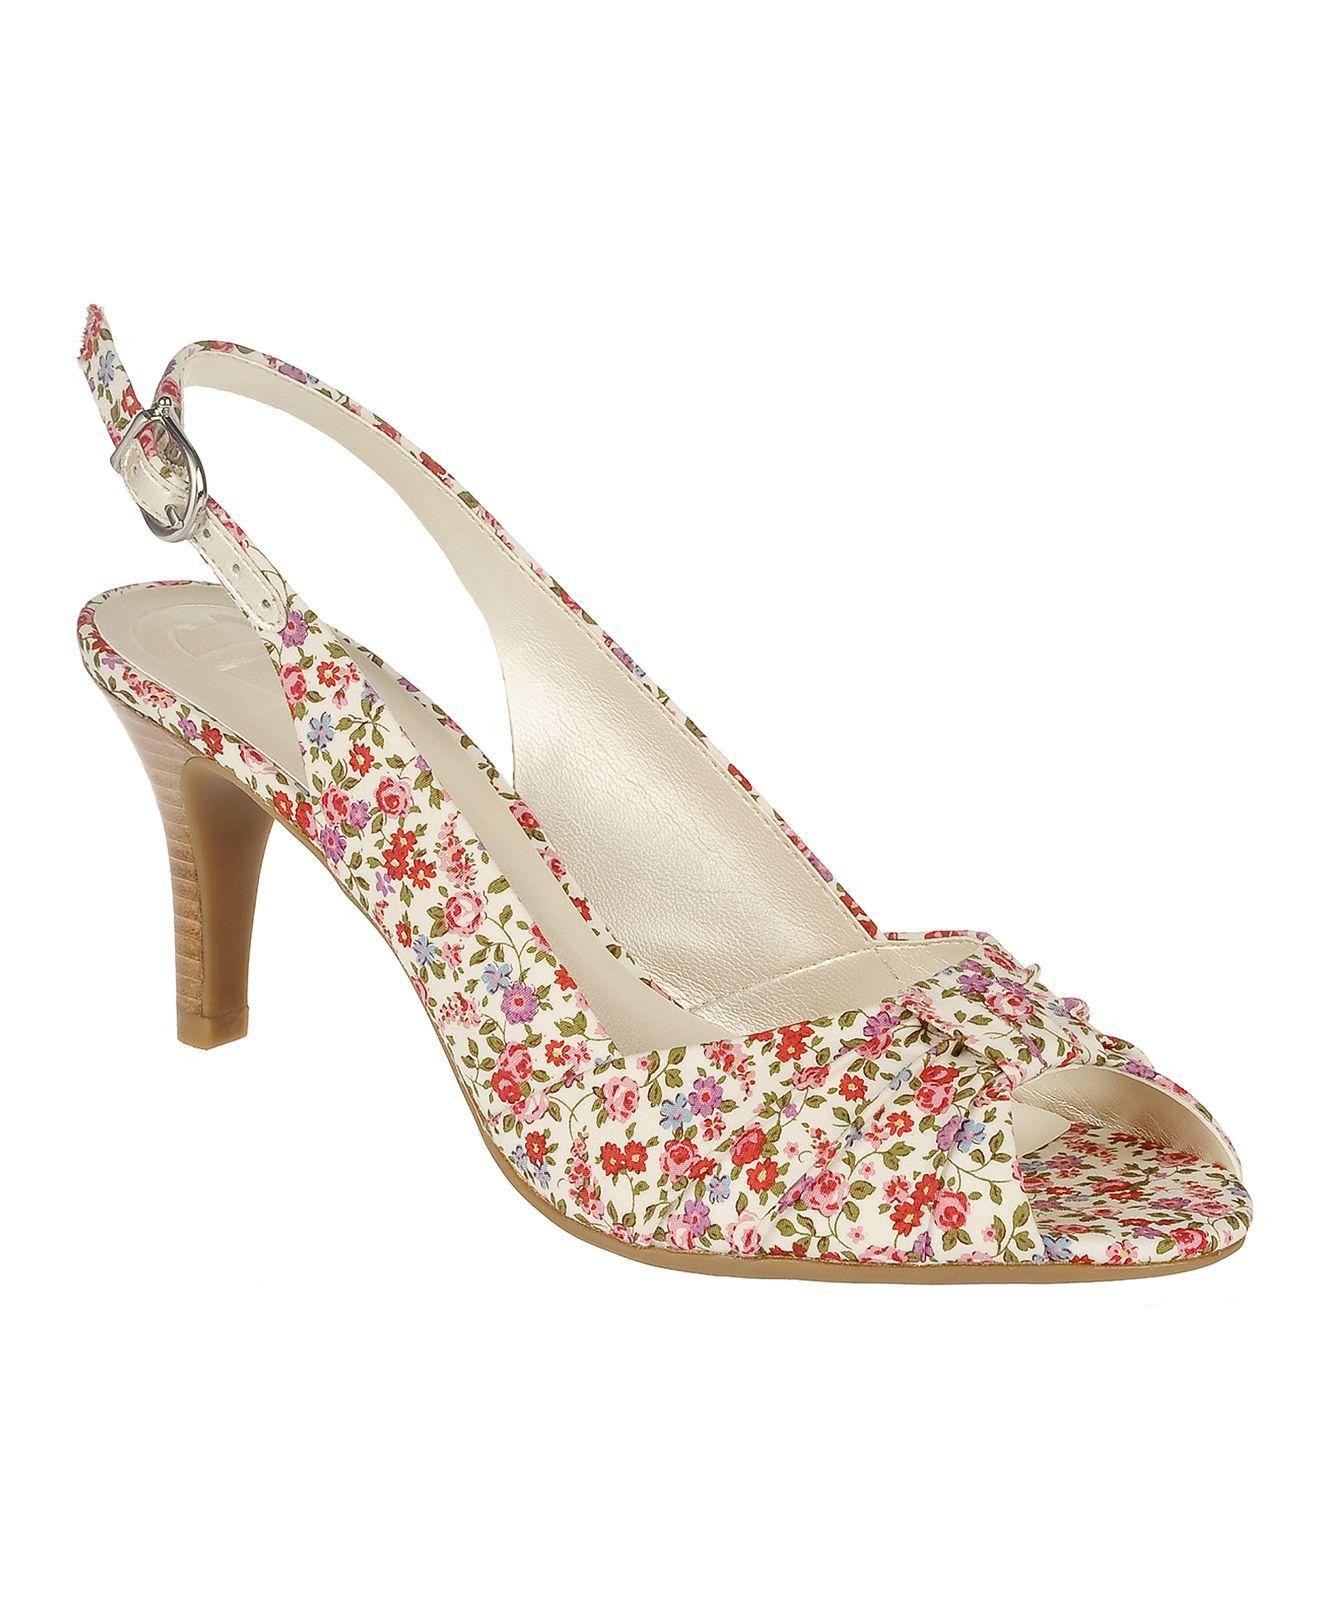 Etienne Aigner Shoes - Osbert Slingback Pumps @ Macy's $69.00